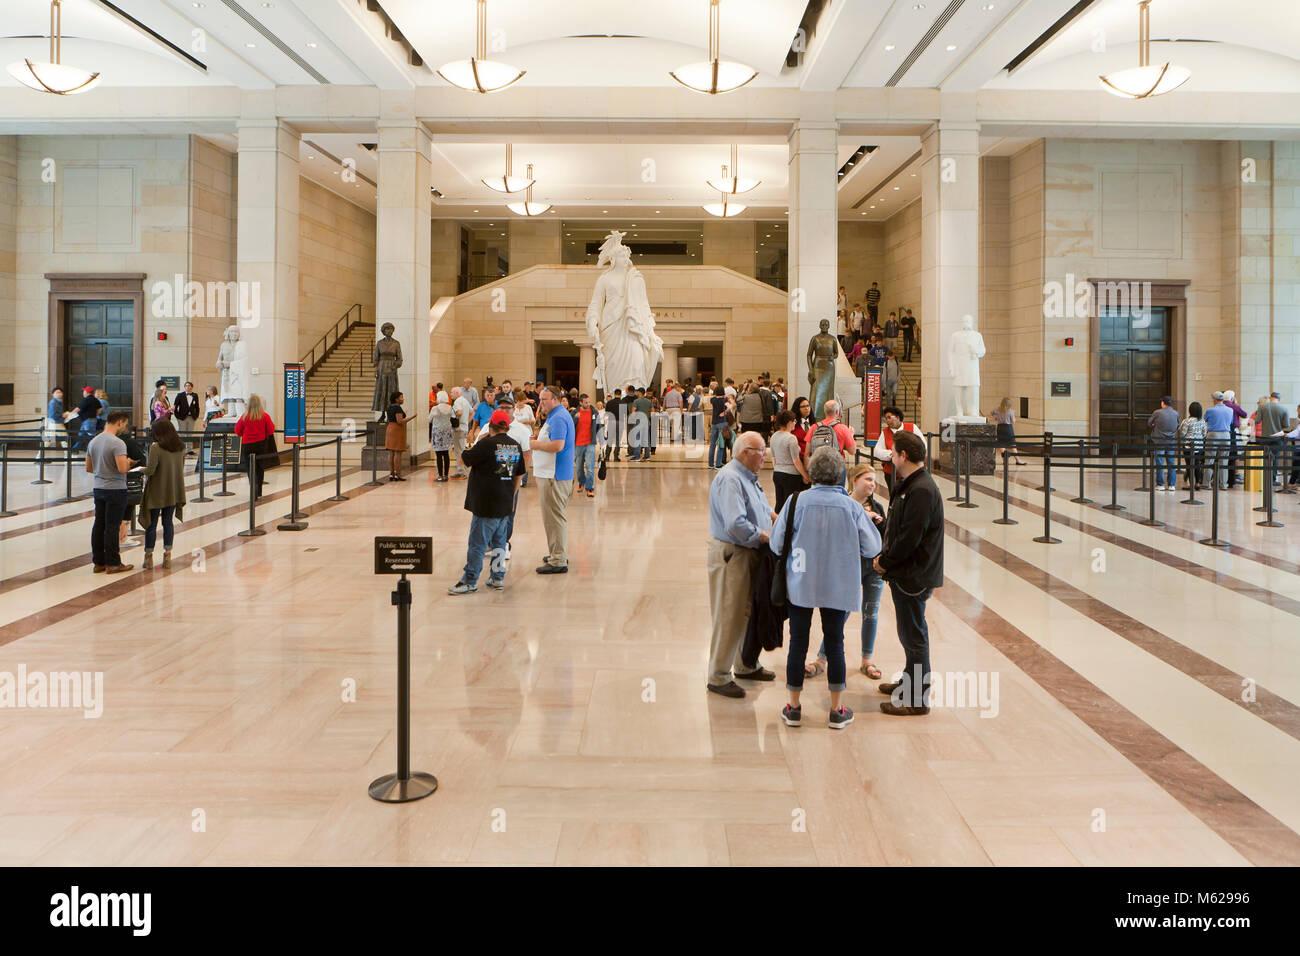 US Capitol building visitor center - Washington, DC USA - Stock Image